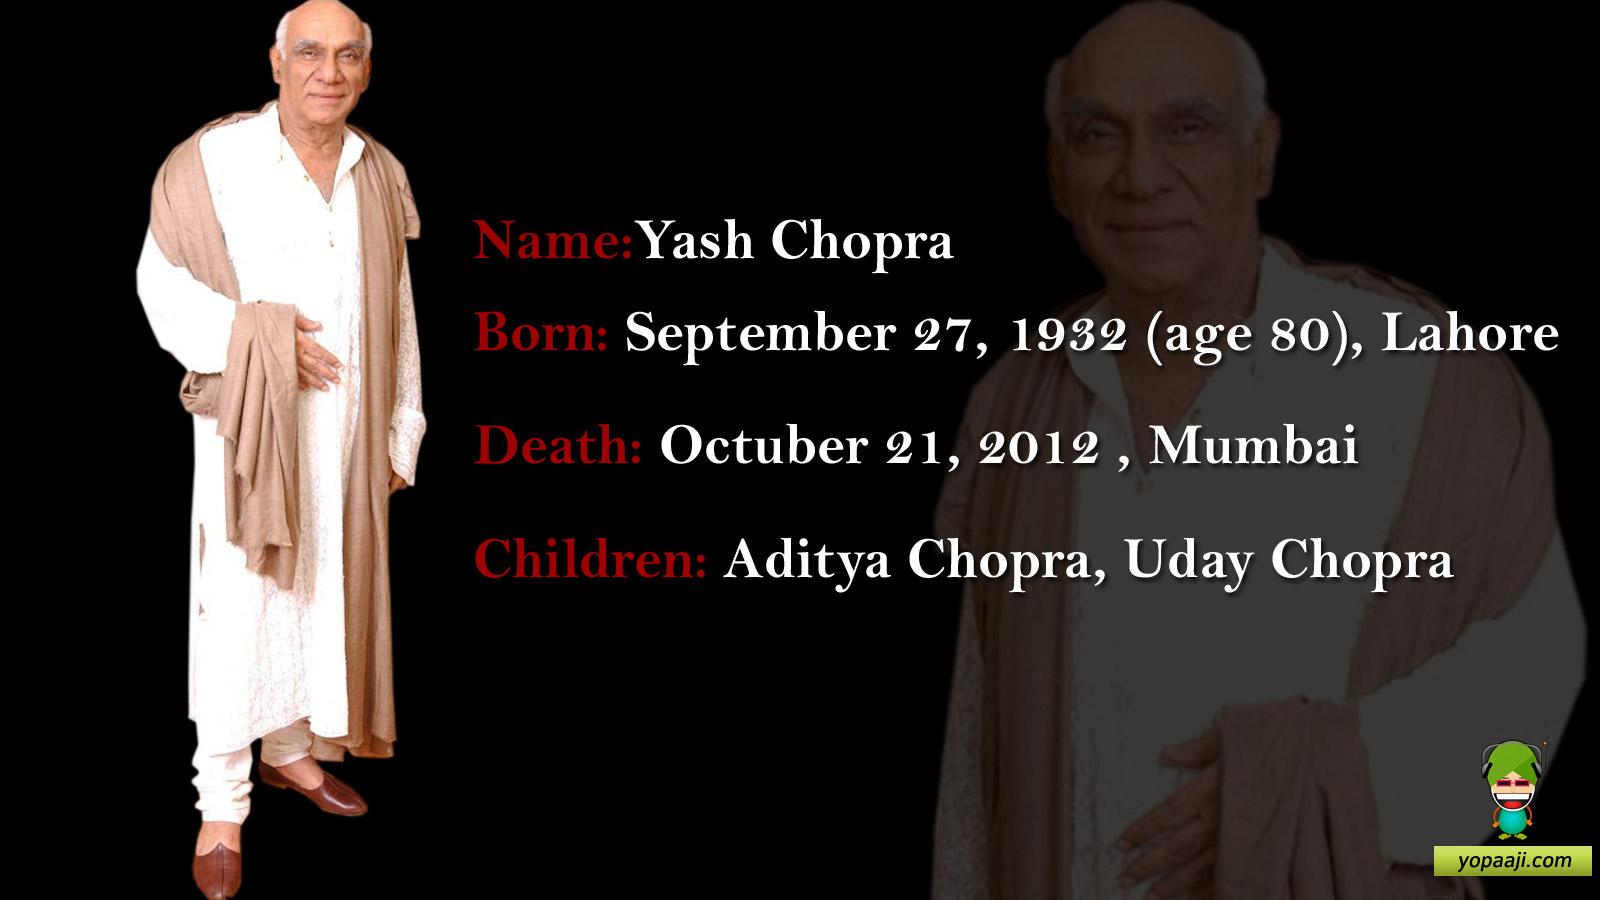 Yash Chopra's quote #1